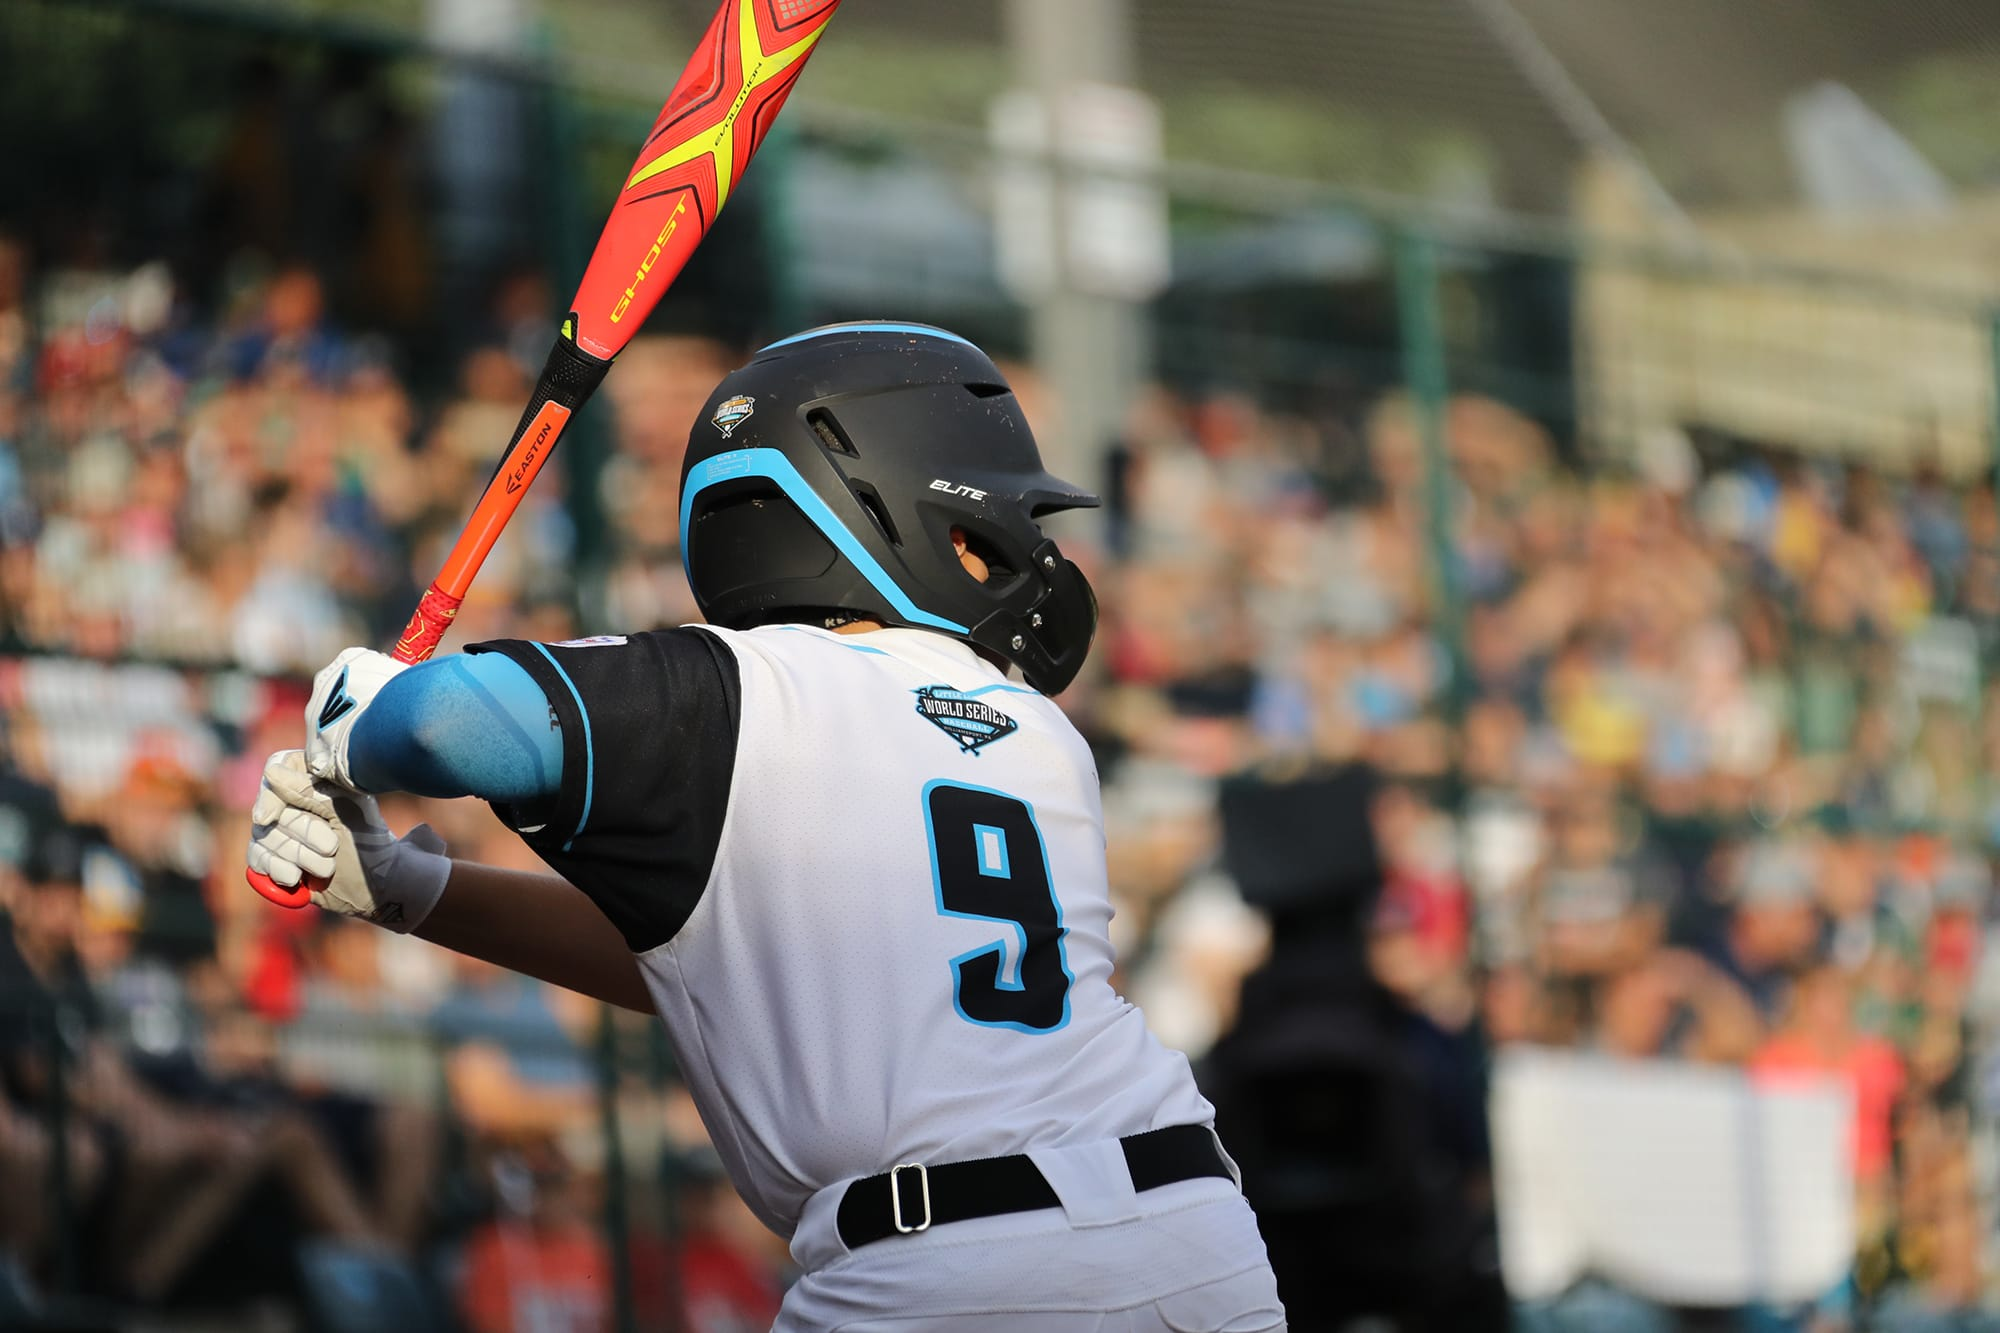 NW number 9 batter